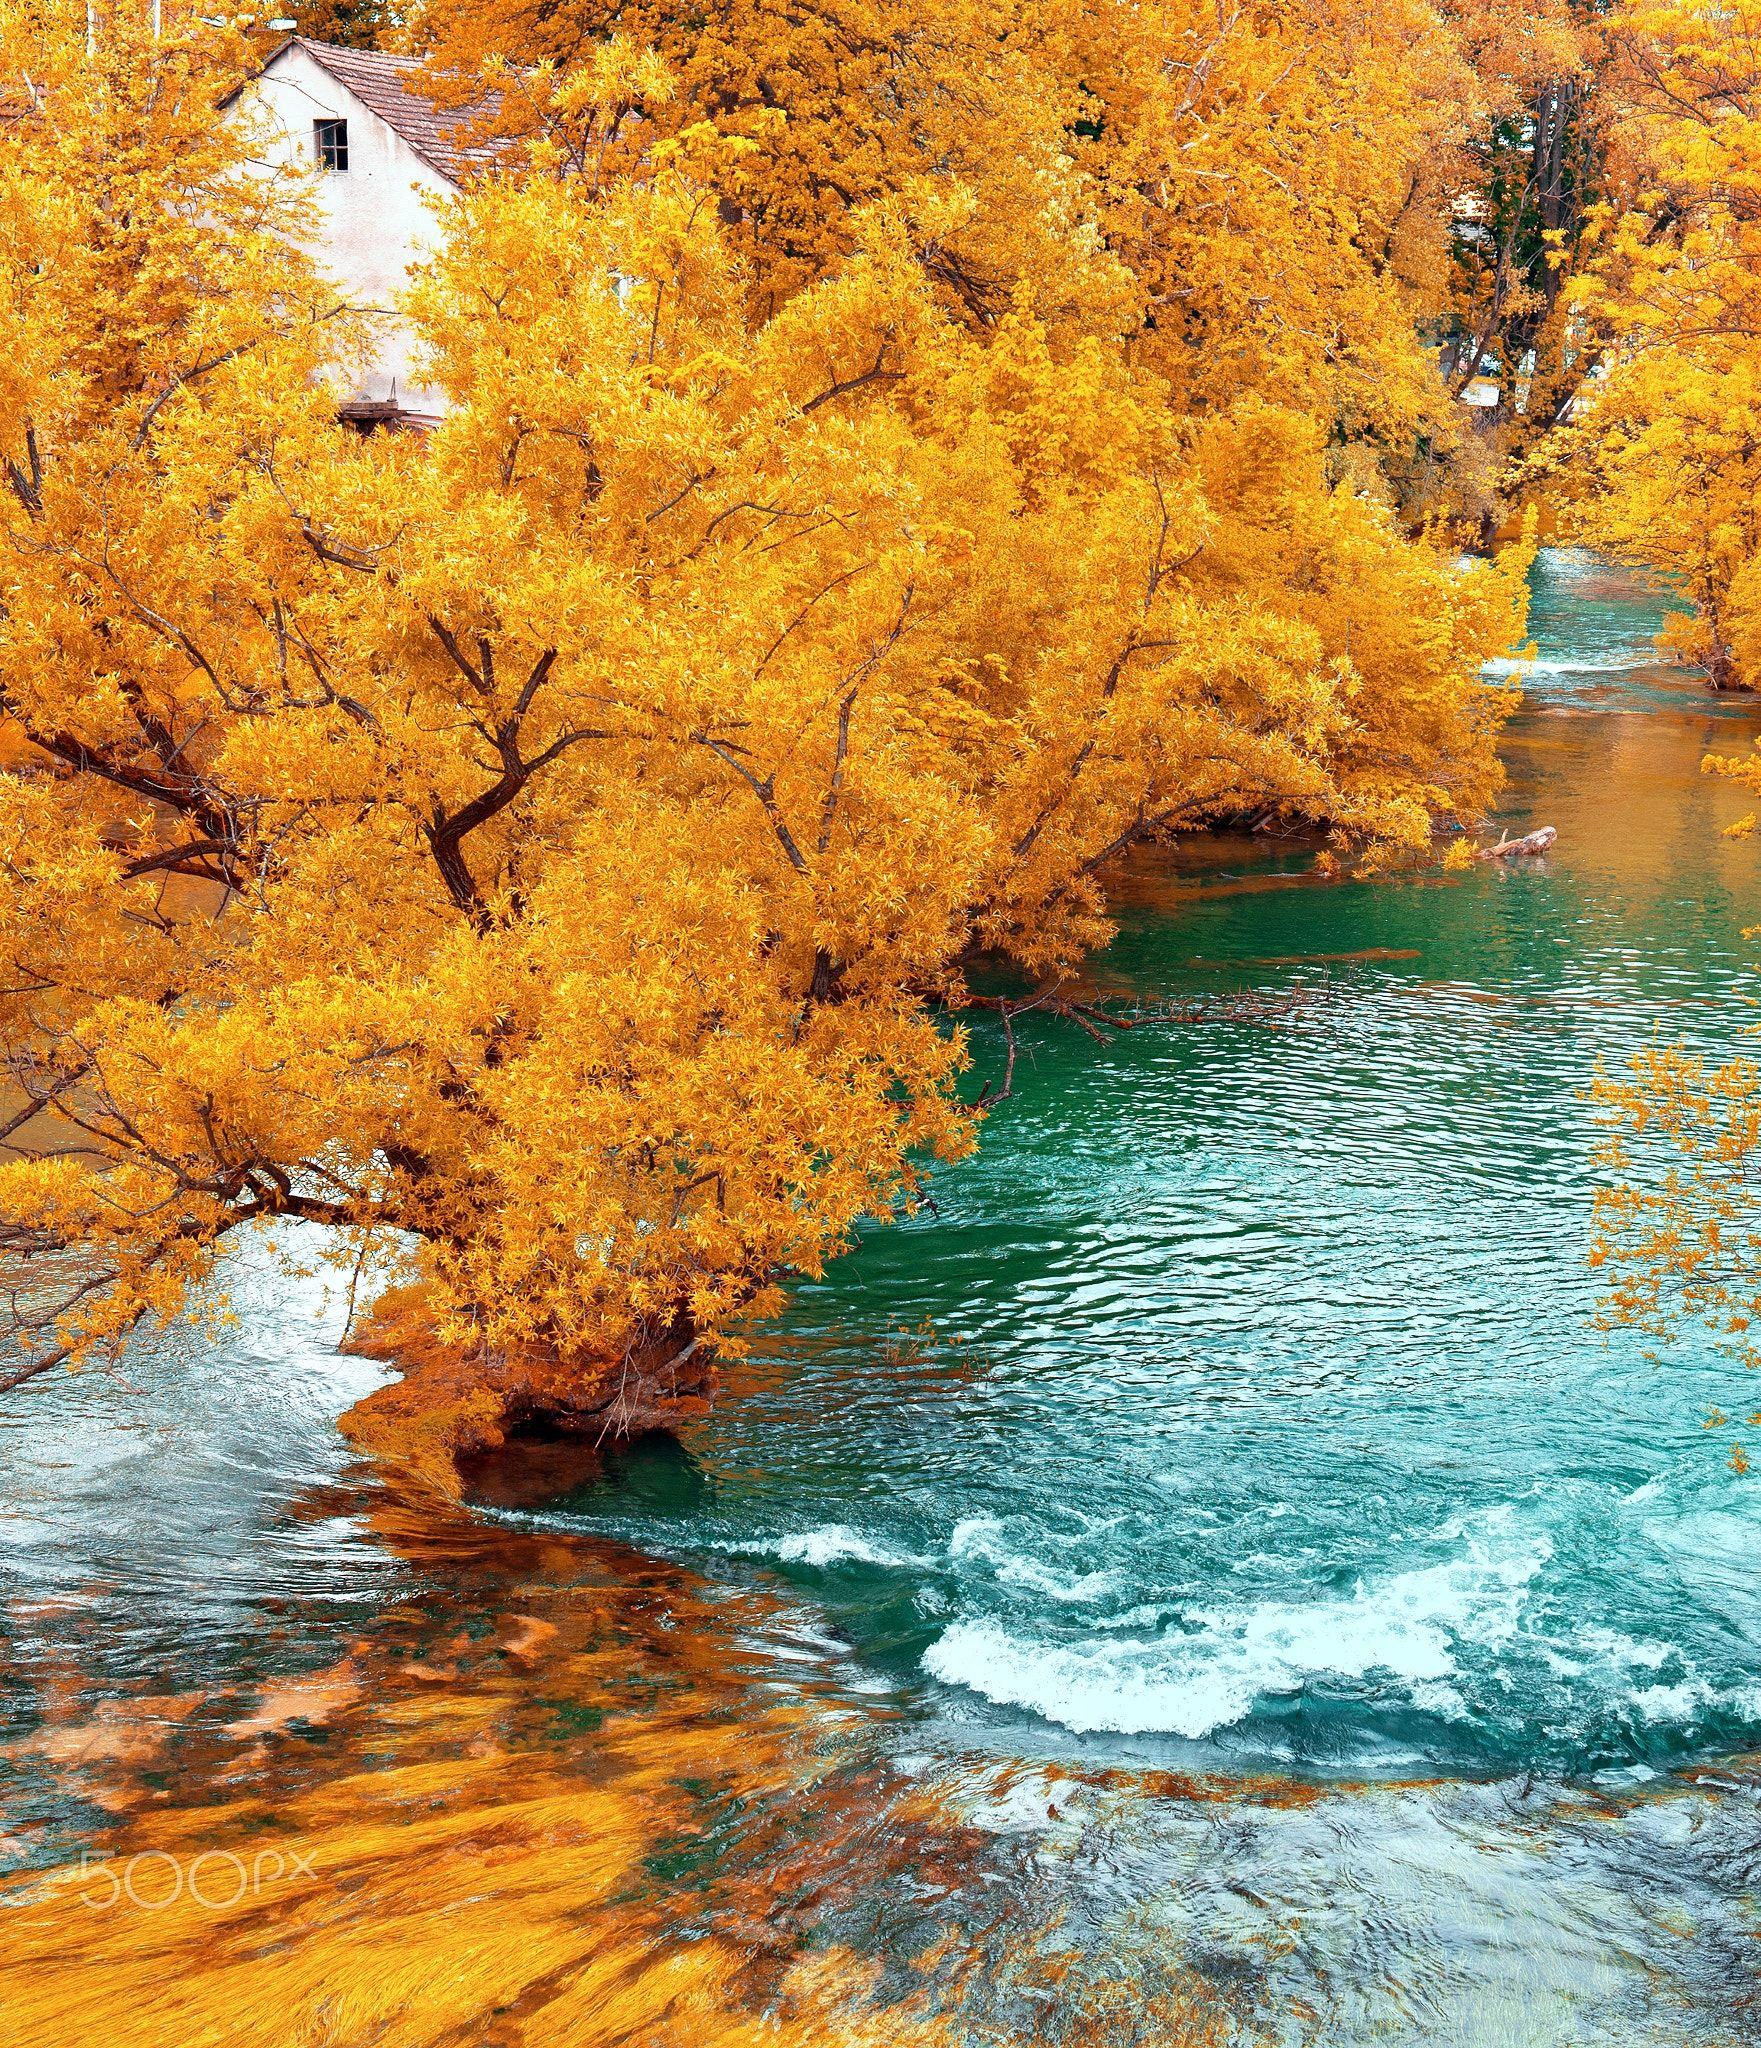 View Of Una River Una River Bihac Bosnia With Images Beautiful Landscape Photography Landscape Photography Fine Art Landscape Photography